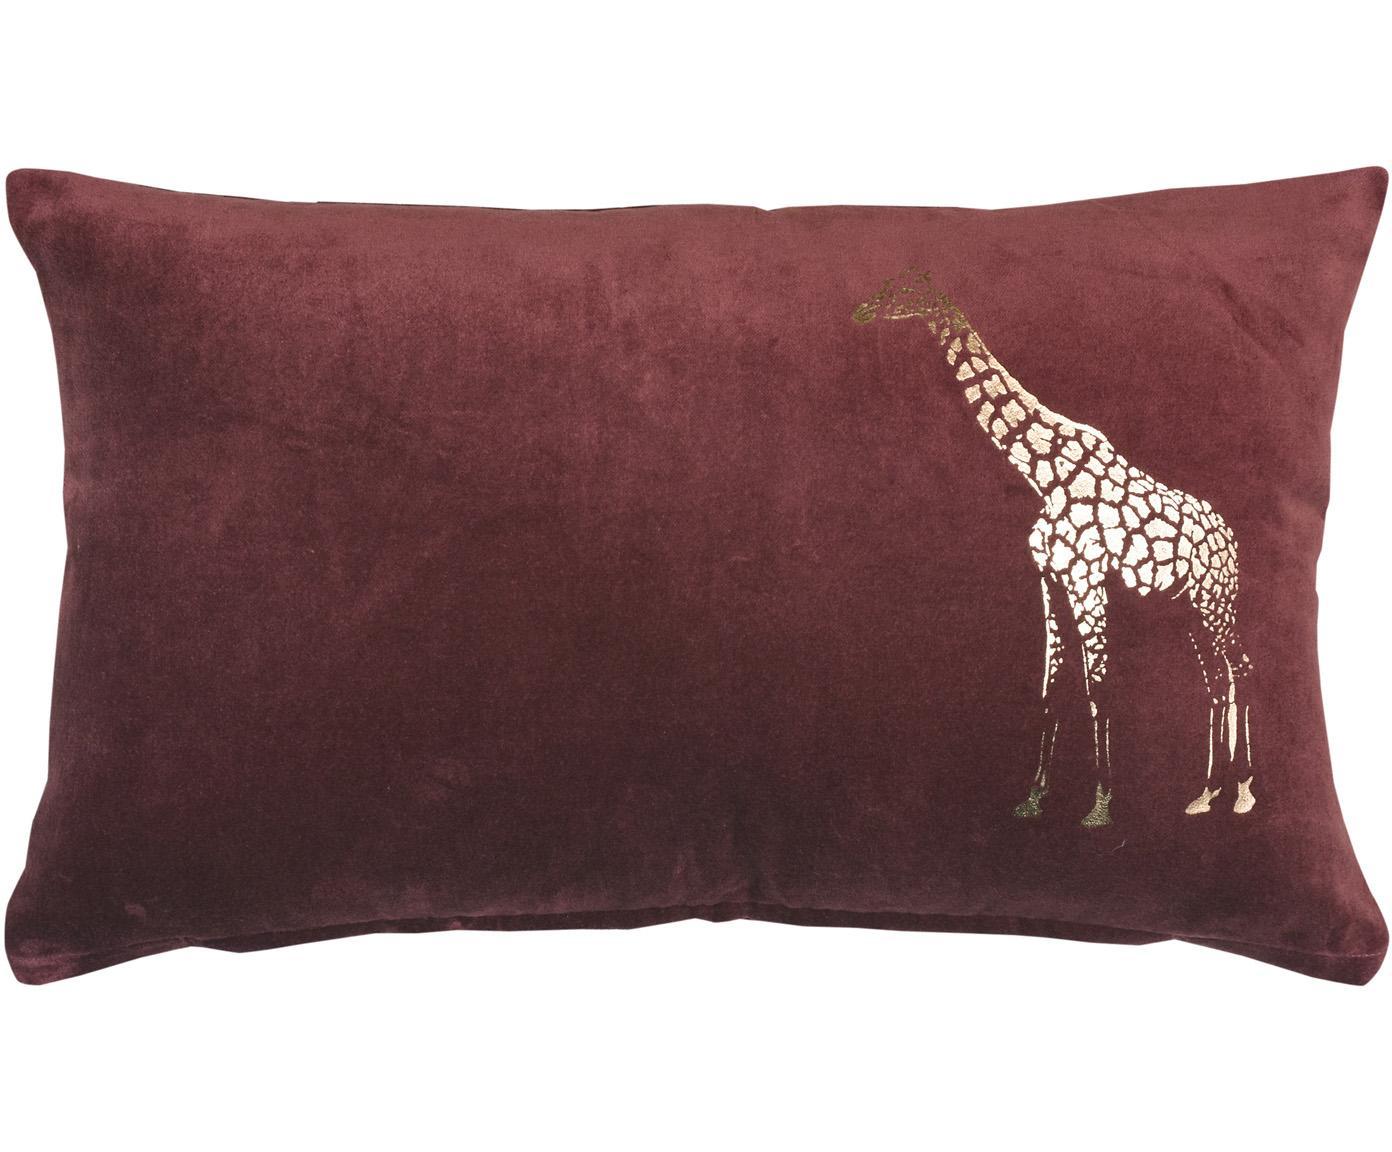 Cuscino con imbottitura Giraffe, Rivestimento: 100% cotone, Colori bordeaux, dorato, Larg. 30 x Lung. 50 cm